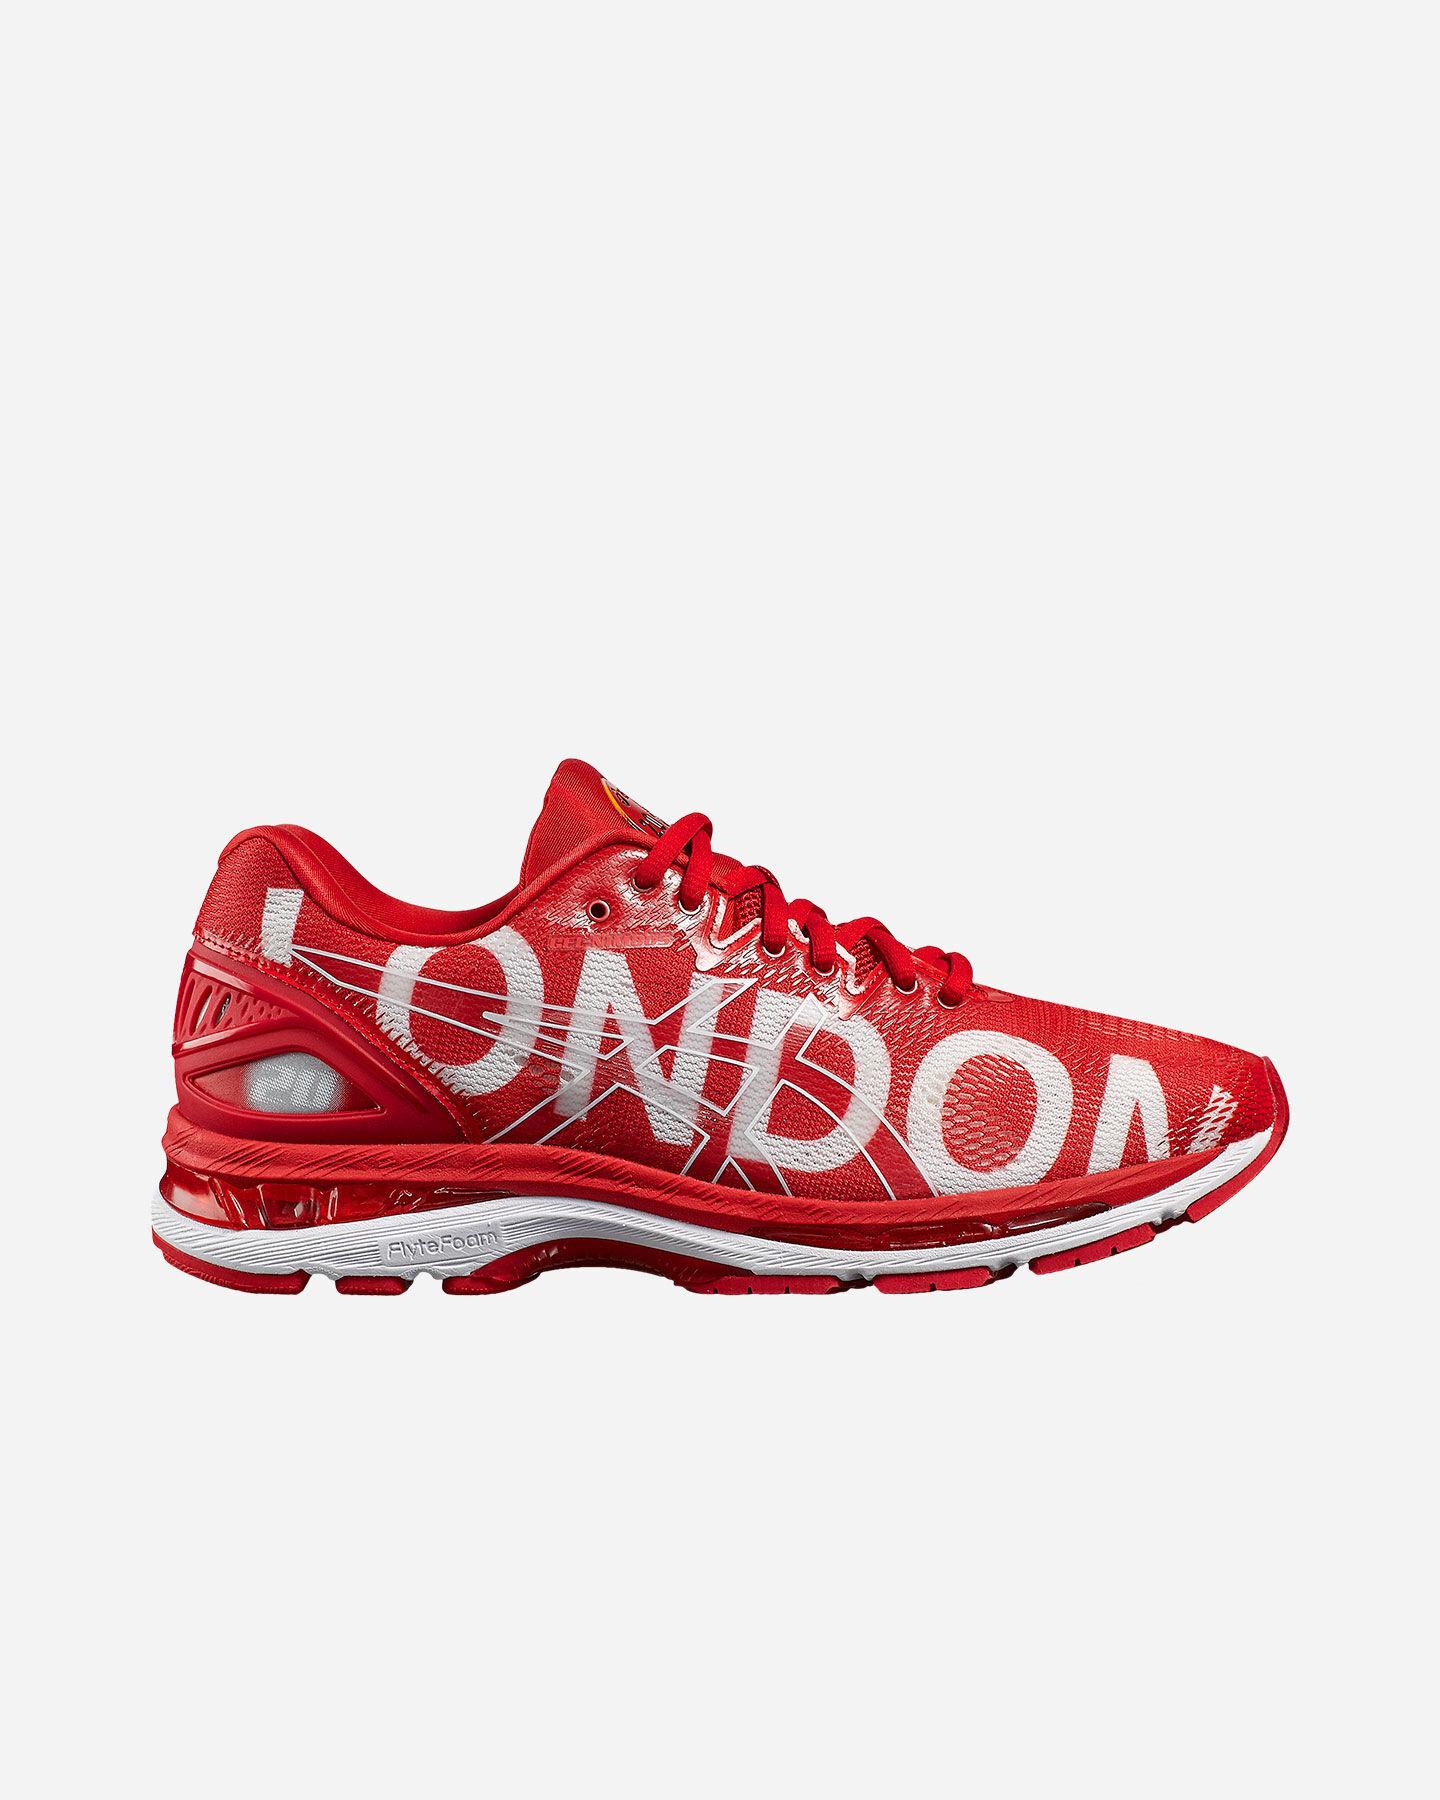 migliori scarpe asics calcio